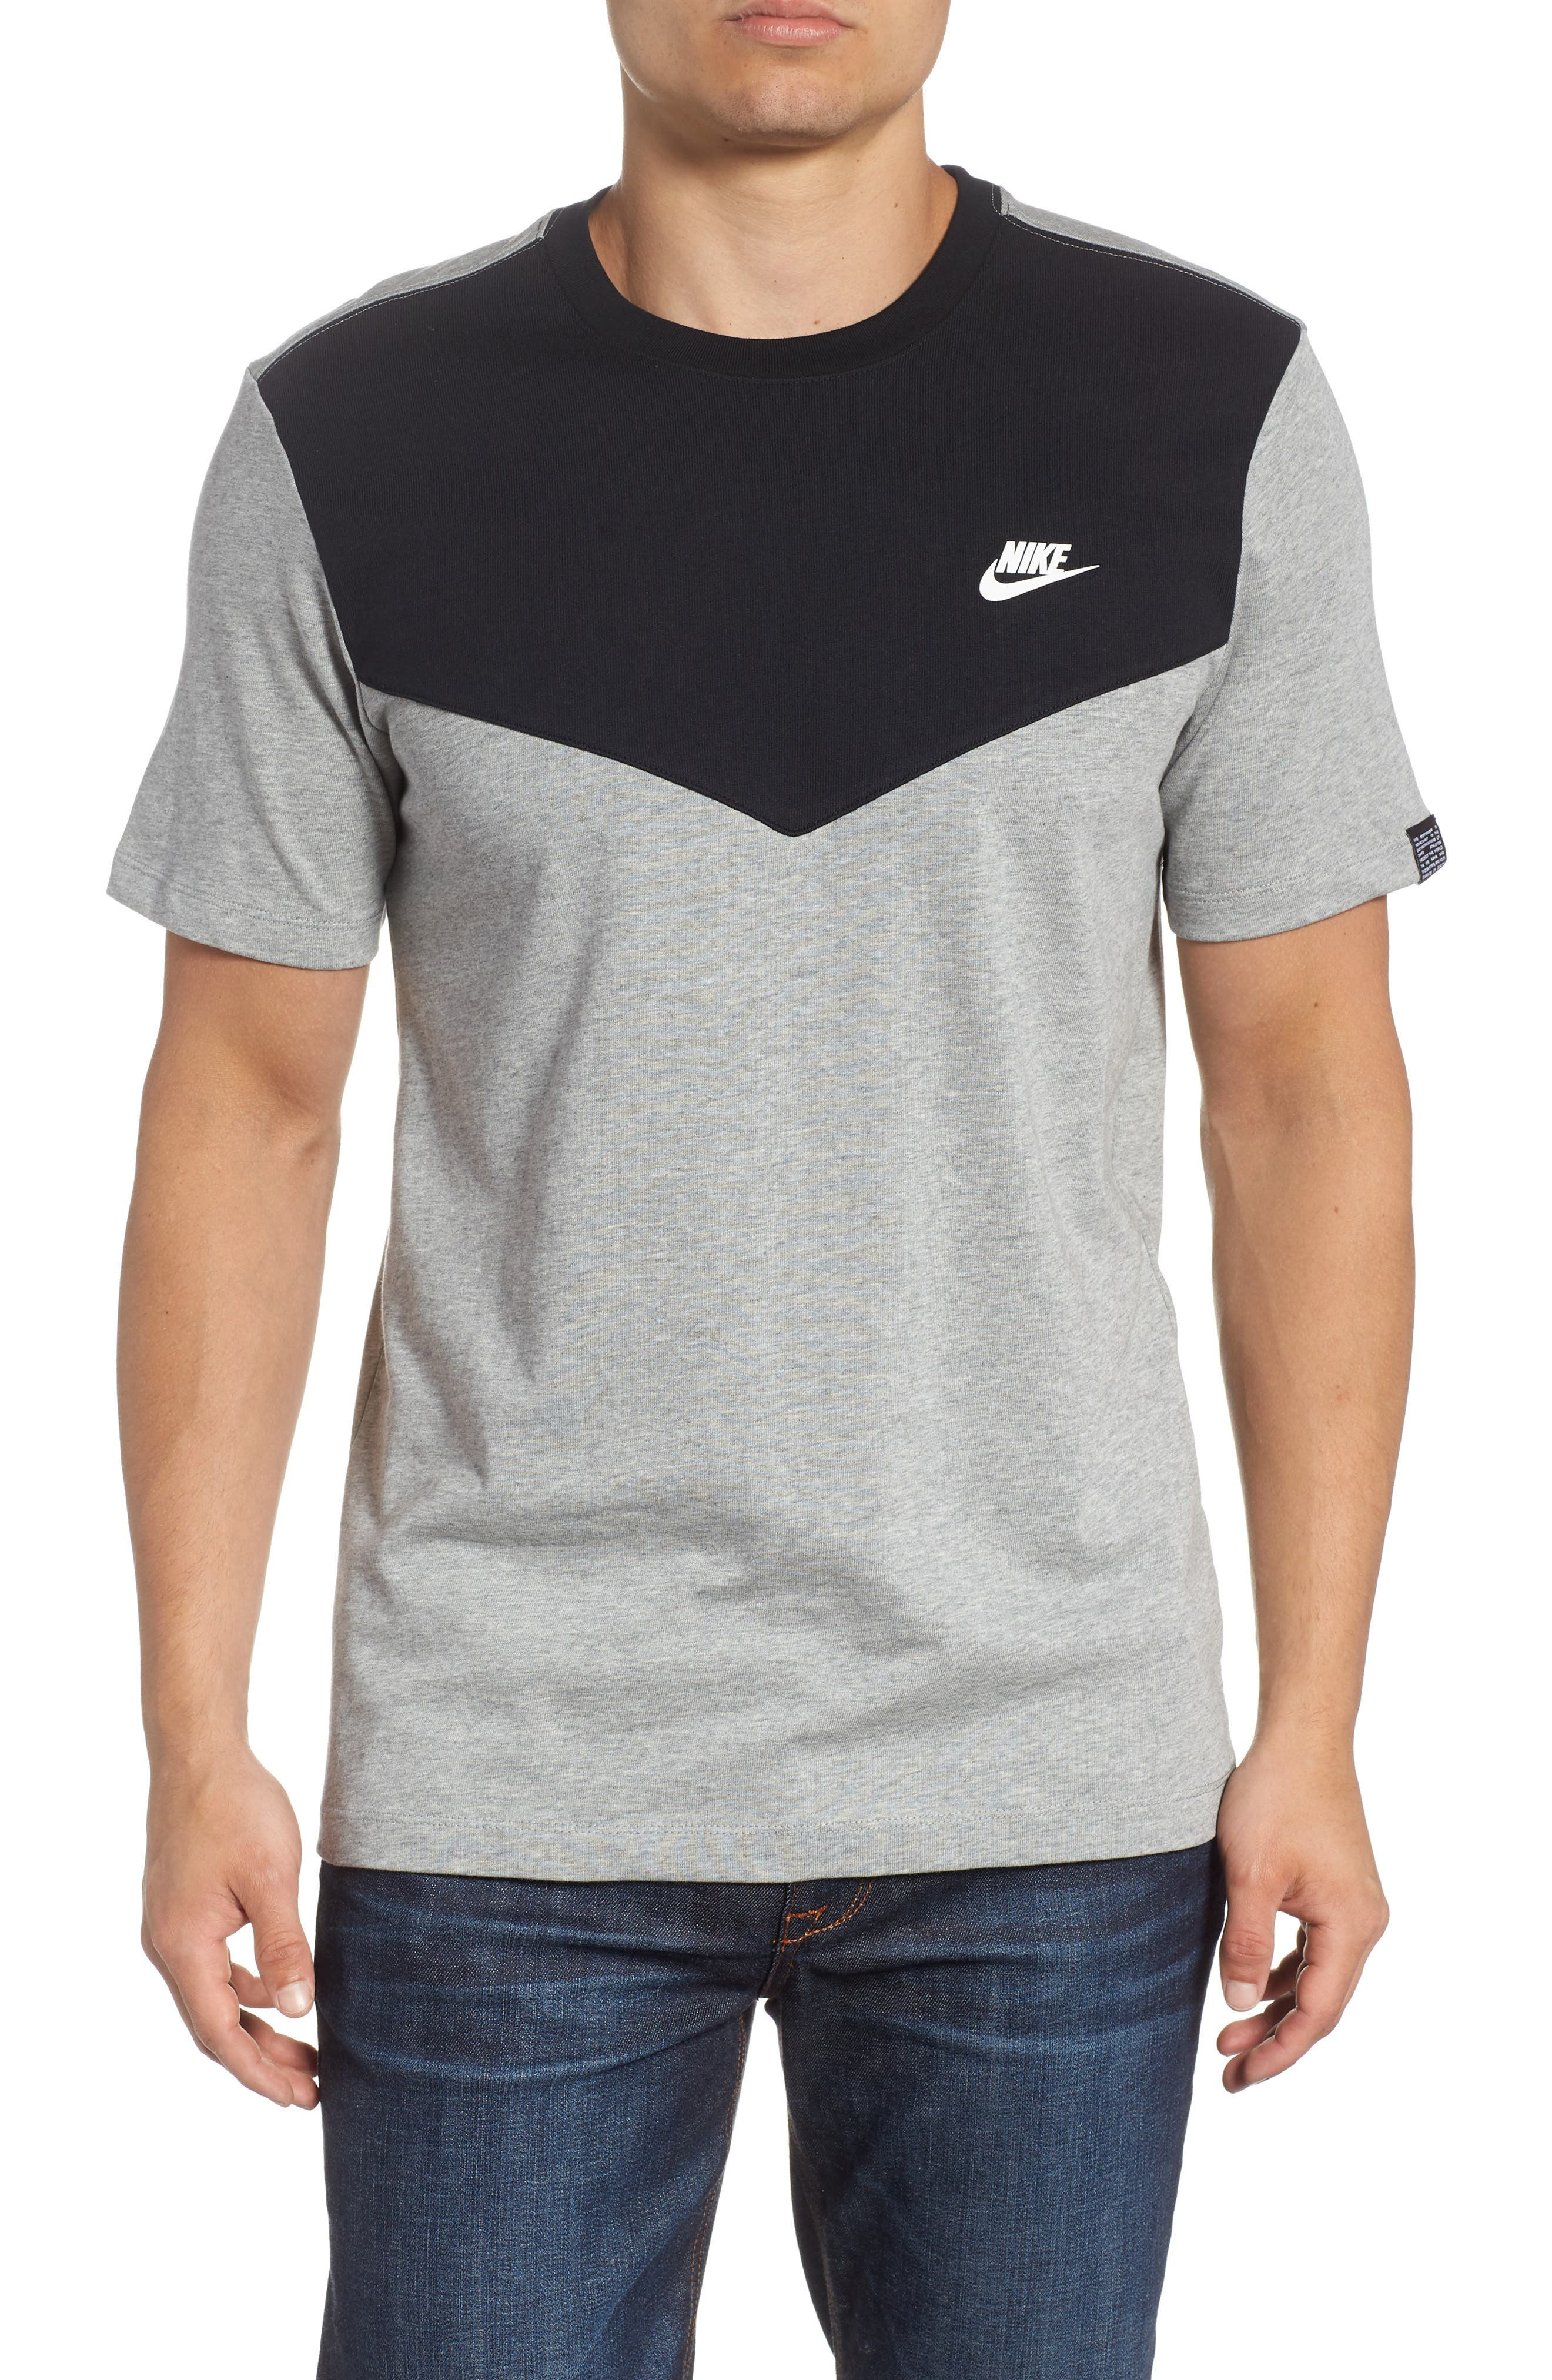 Windrunner Colorblocked T-Shirt,                         Main,                         color, BLACK/ DK GREY HEATHER/ WHITE